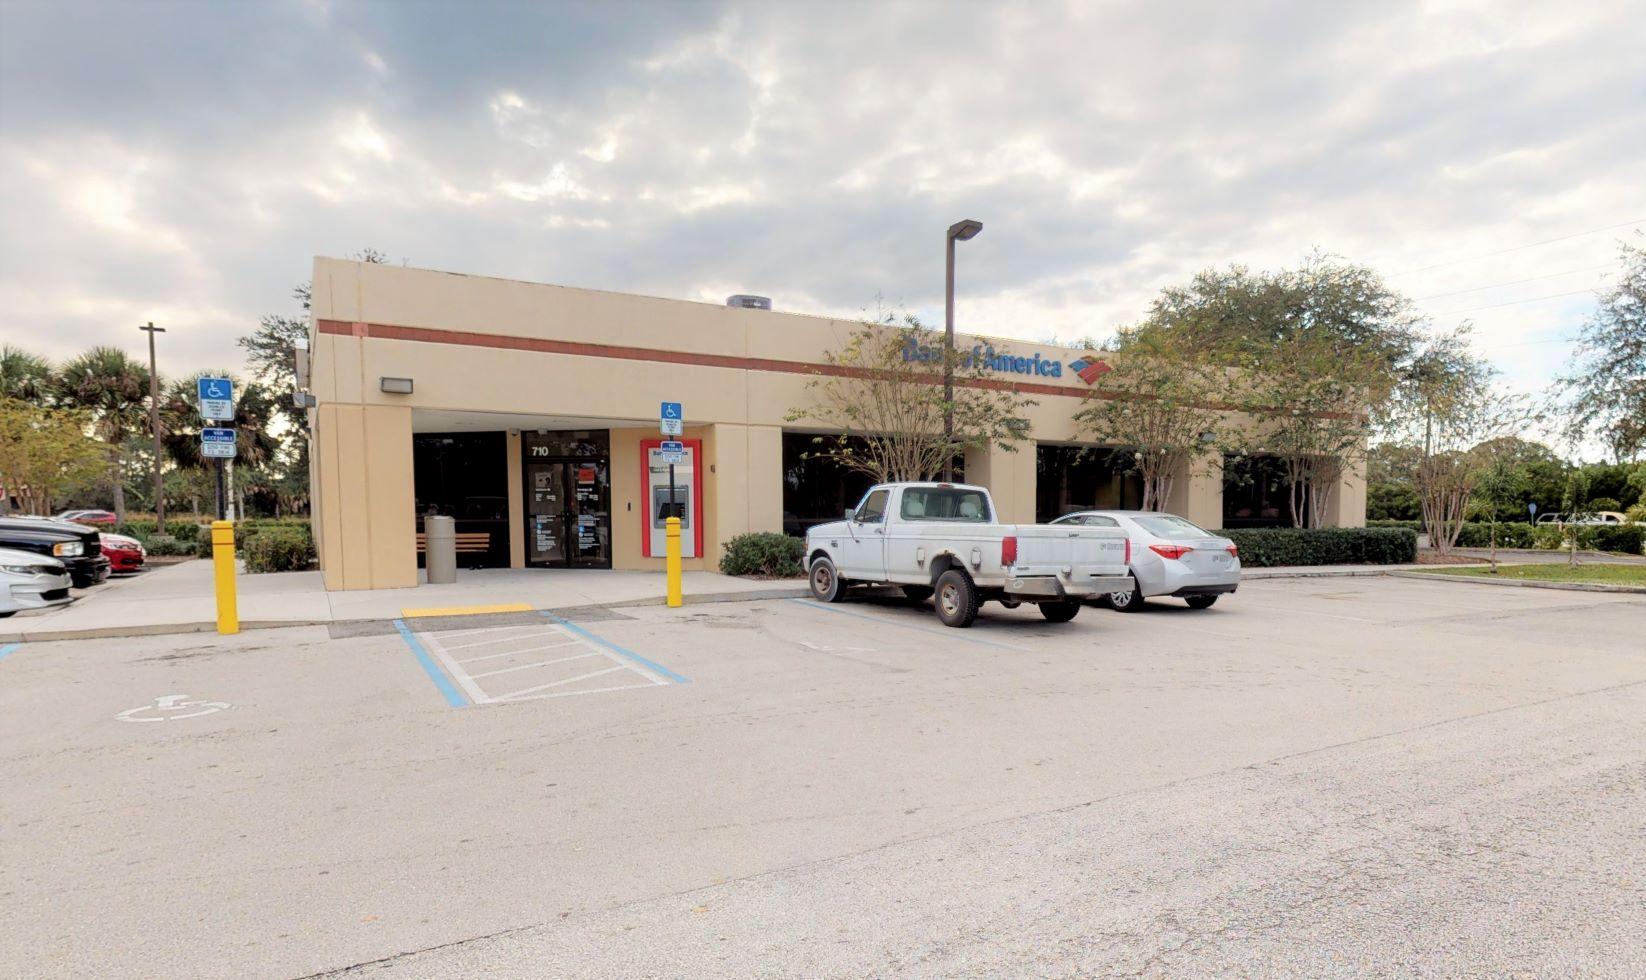 Bank of America financial center with drive-thru ATM | 710 S Fleming St, Sebastian, FL 32958